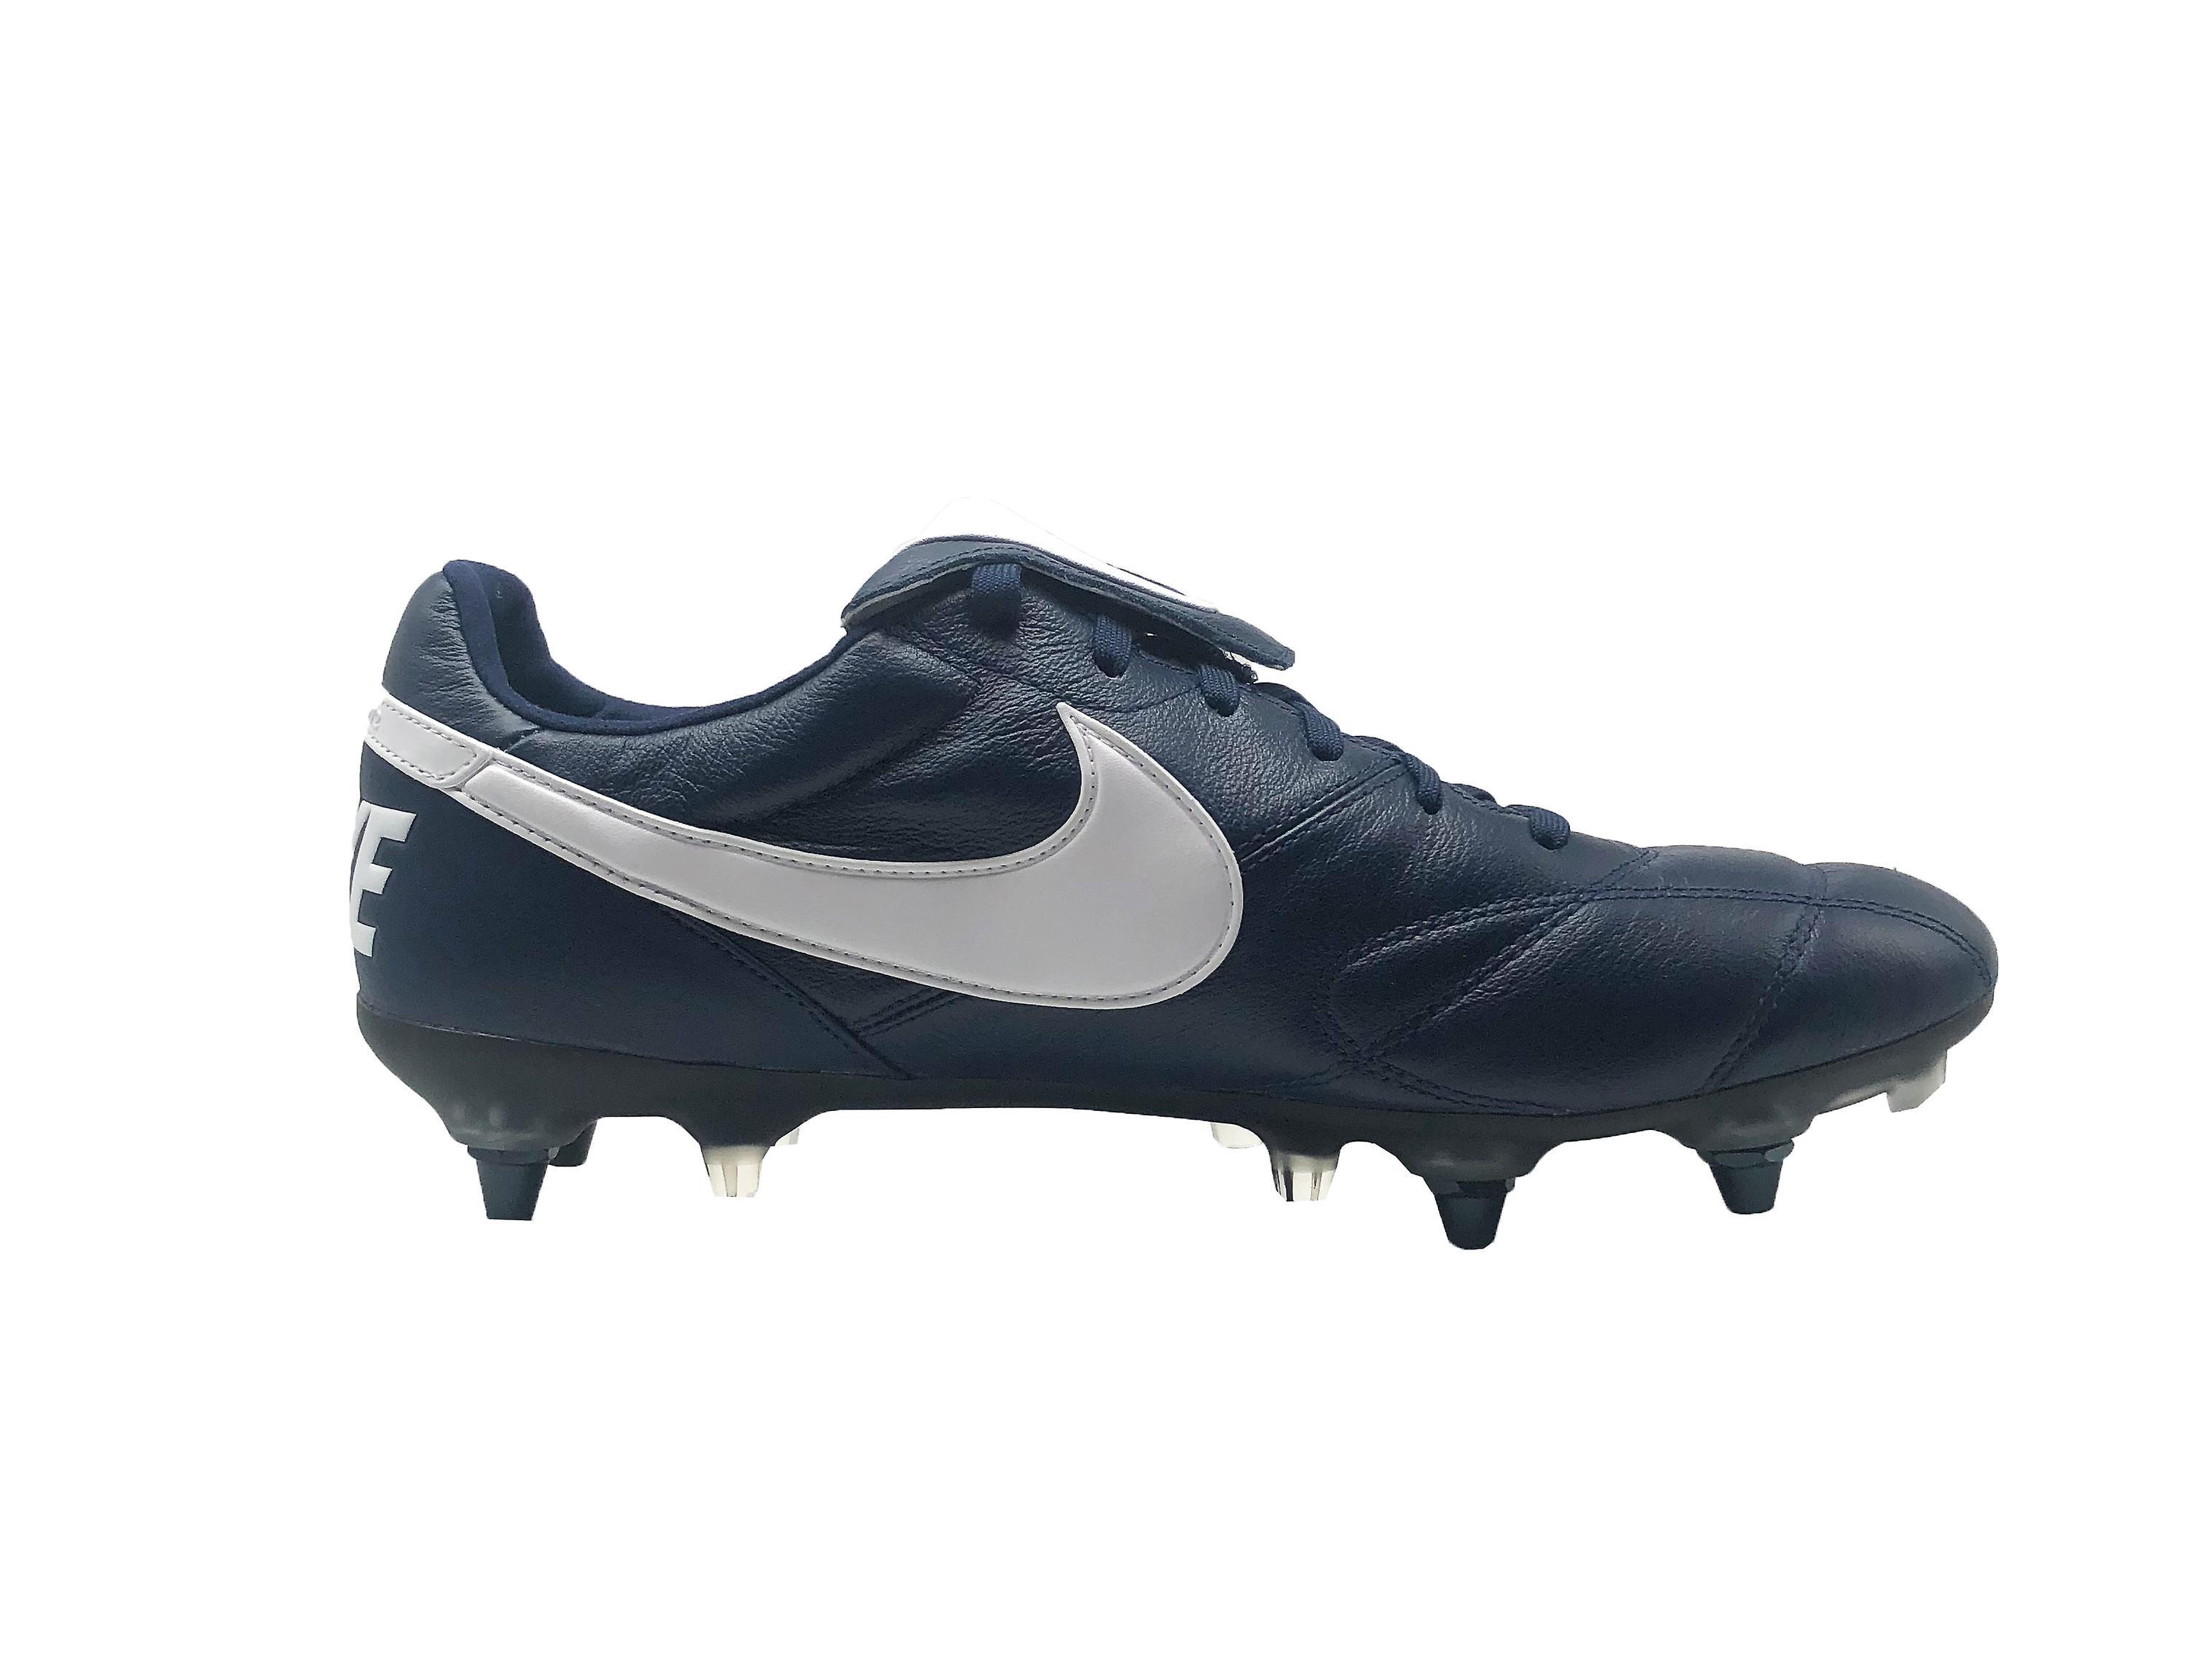 Nike Premier II SG-PRO AC 921397 404 Mens fotboll stövlar